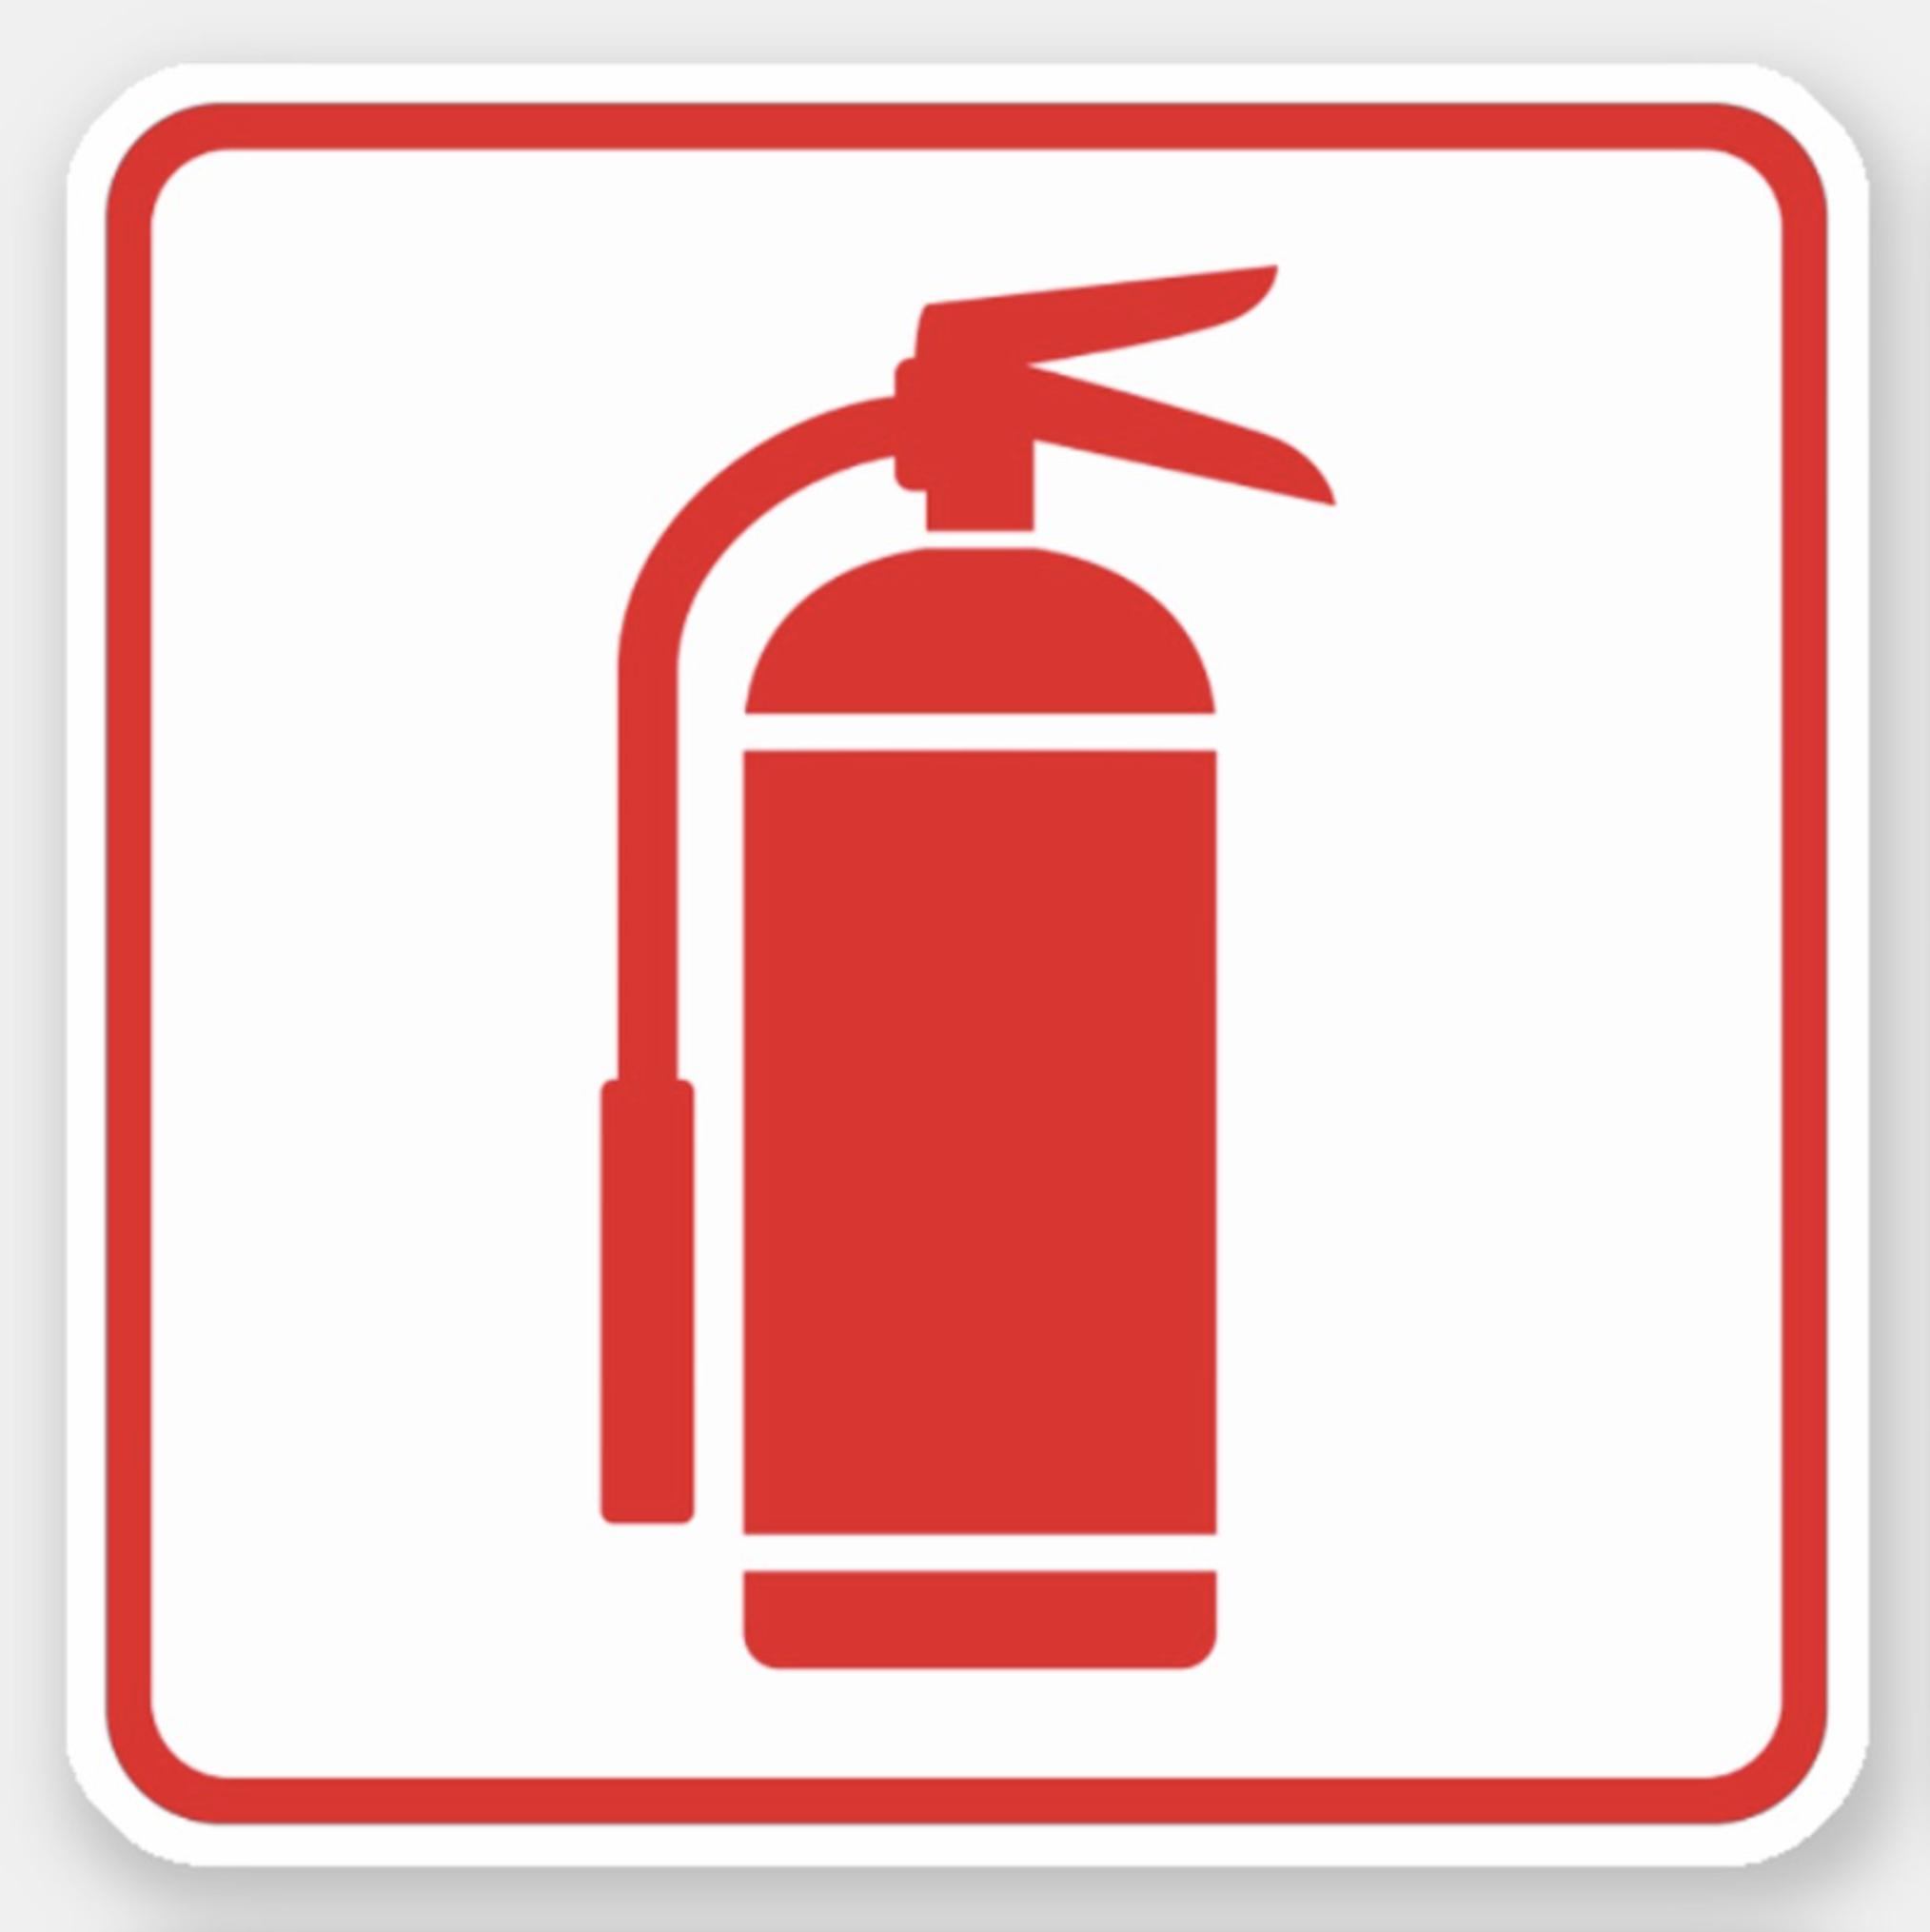 Fire extinguisher symbol, red on white, red border sticker.